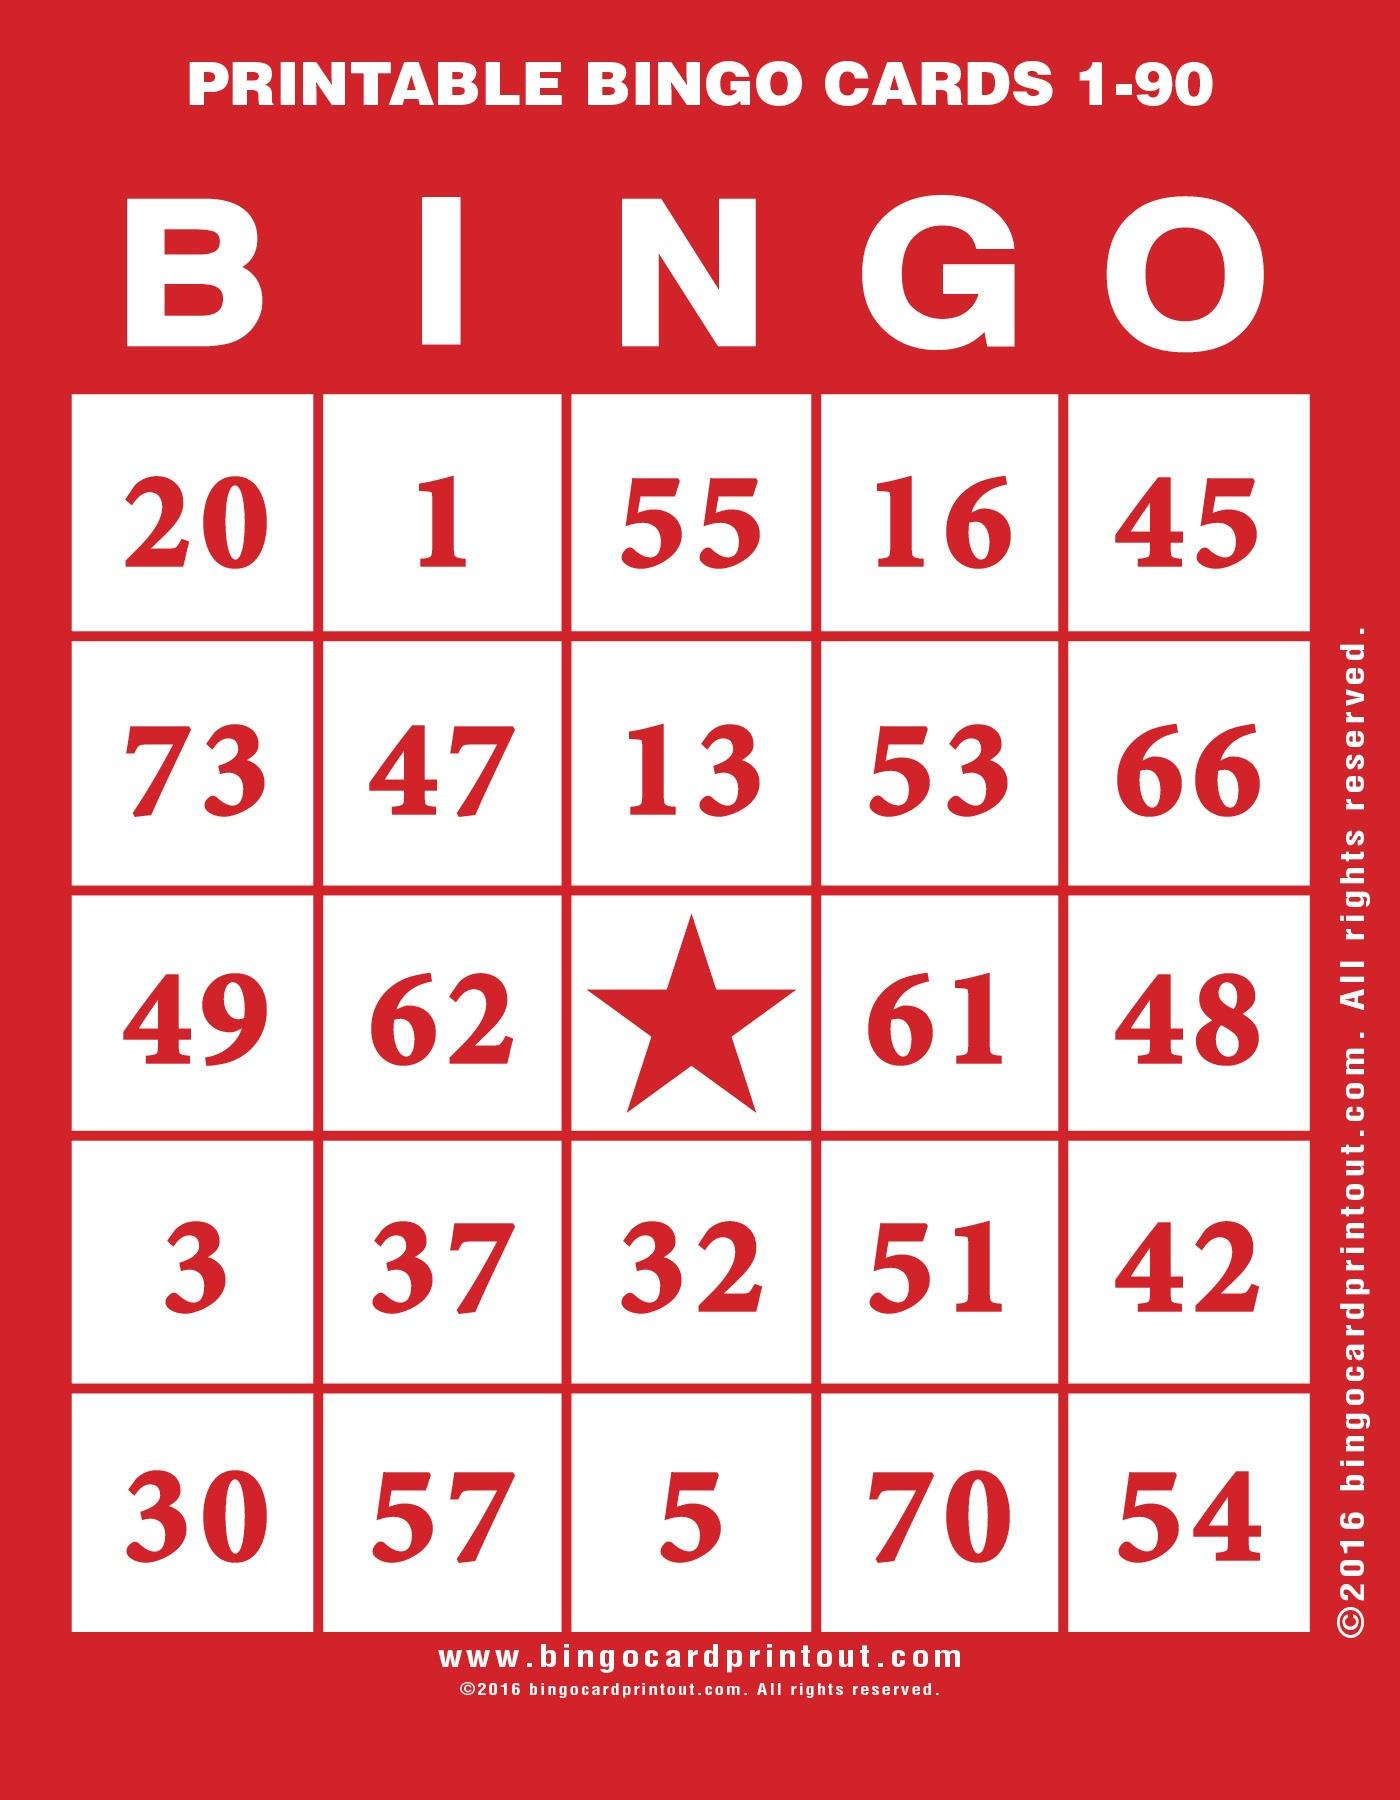 Printable Bingo Cards 1-90 - Bingocardprintout - Free Printable Bingo Cards 1 75